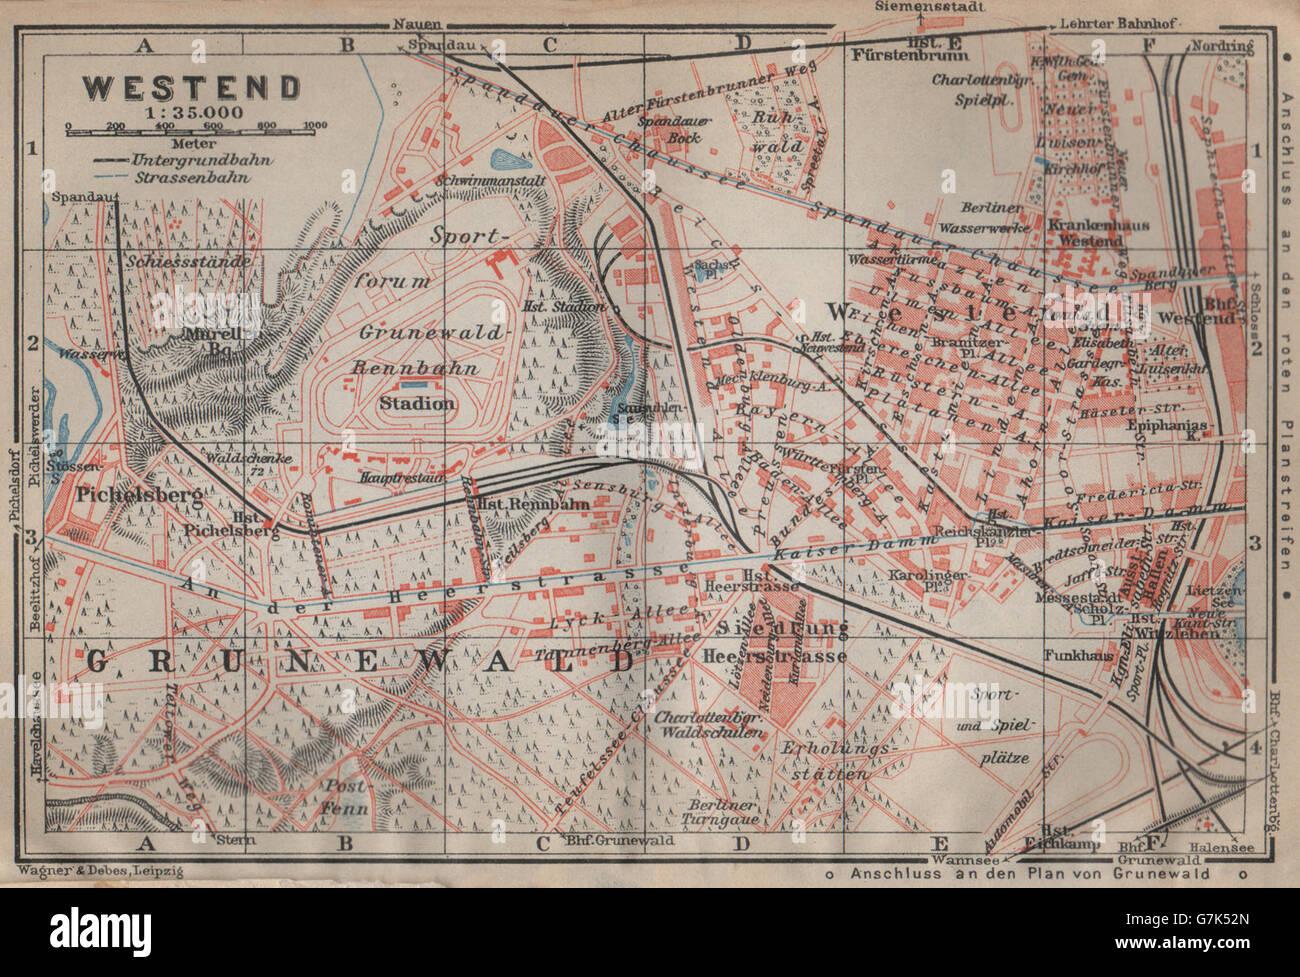 West Berlin Karte.Berlin Vintage Stock Photos Berlin Vintage Stock Images Alamy